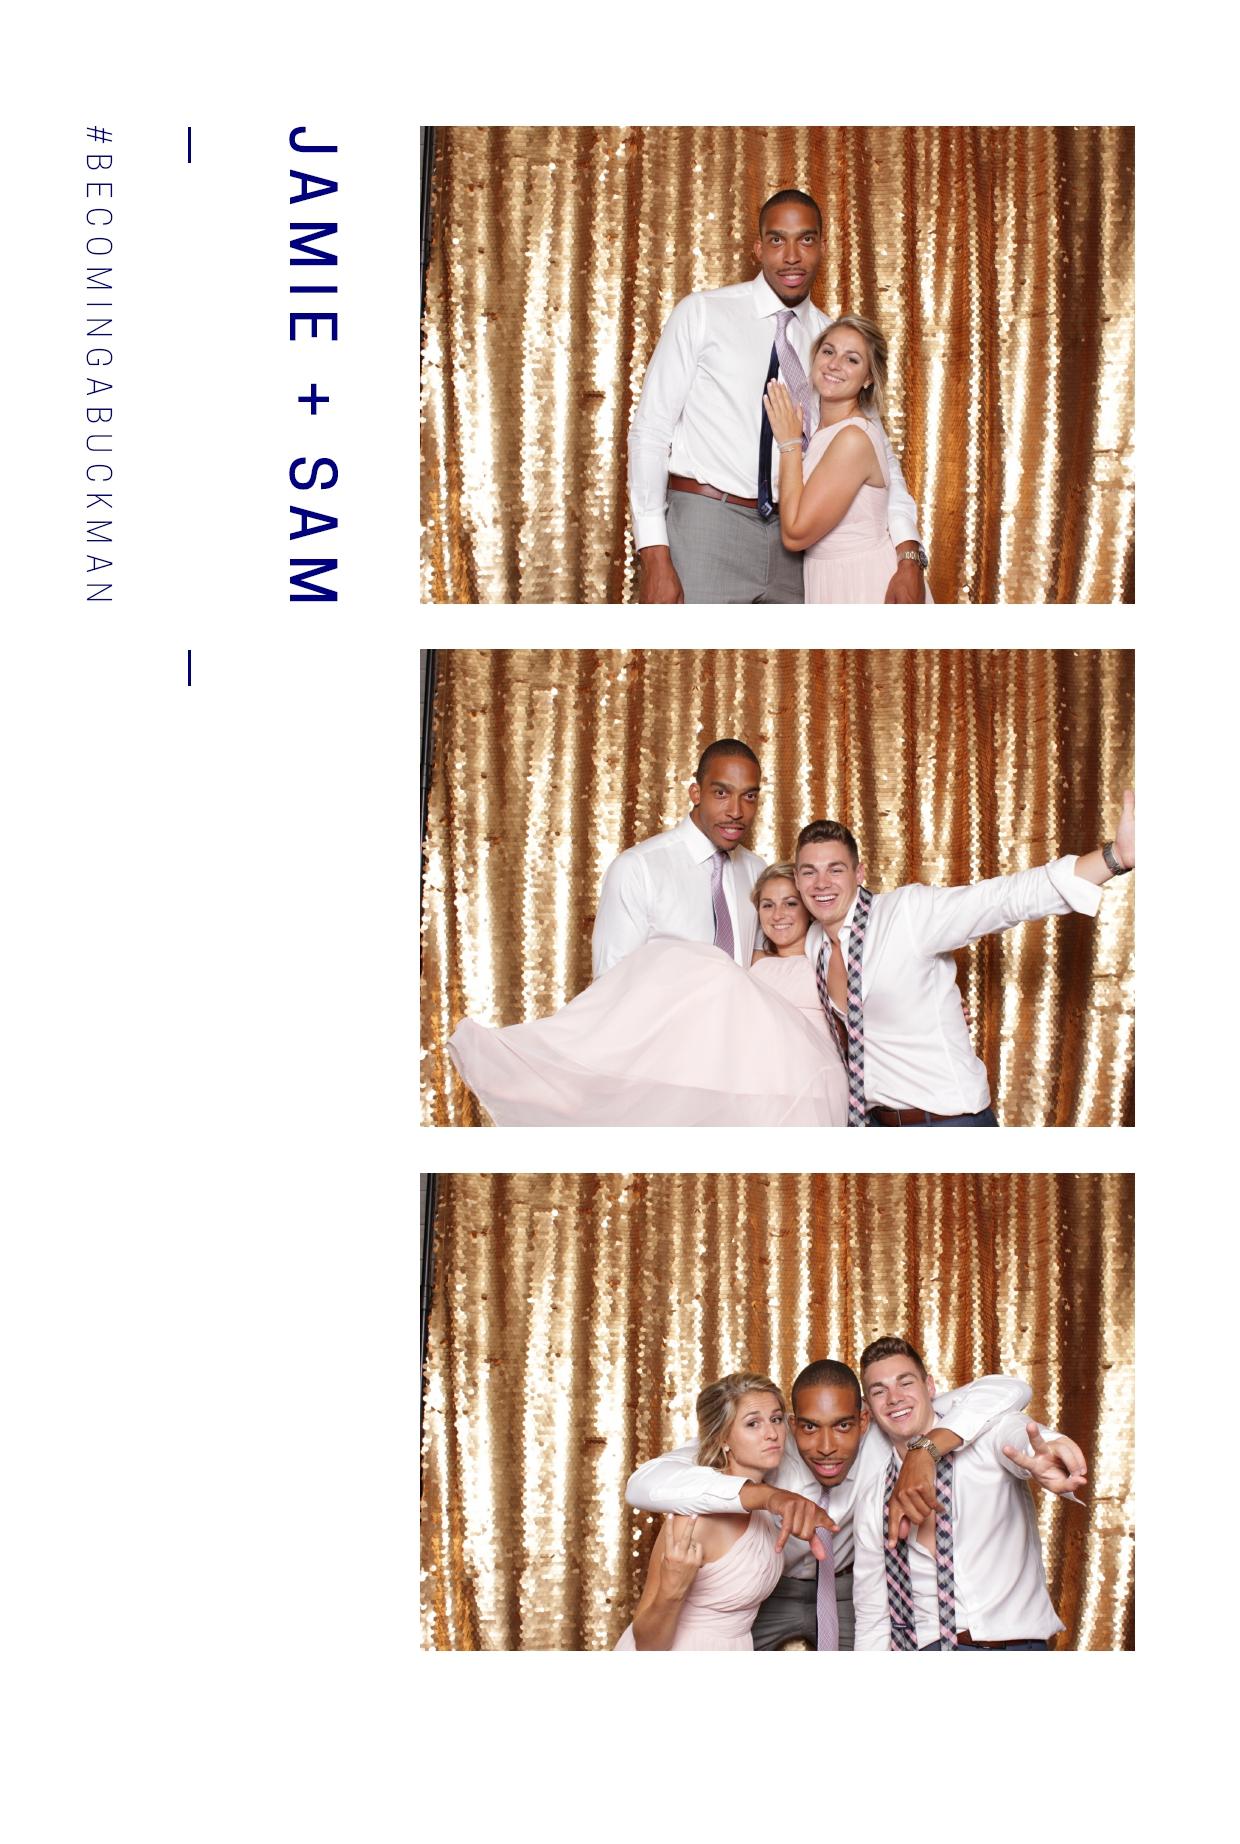 Minneapolis_wedding_photo_booth_Machine_Shop (5).jpg